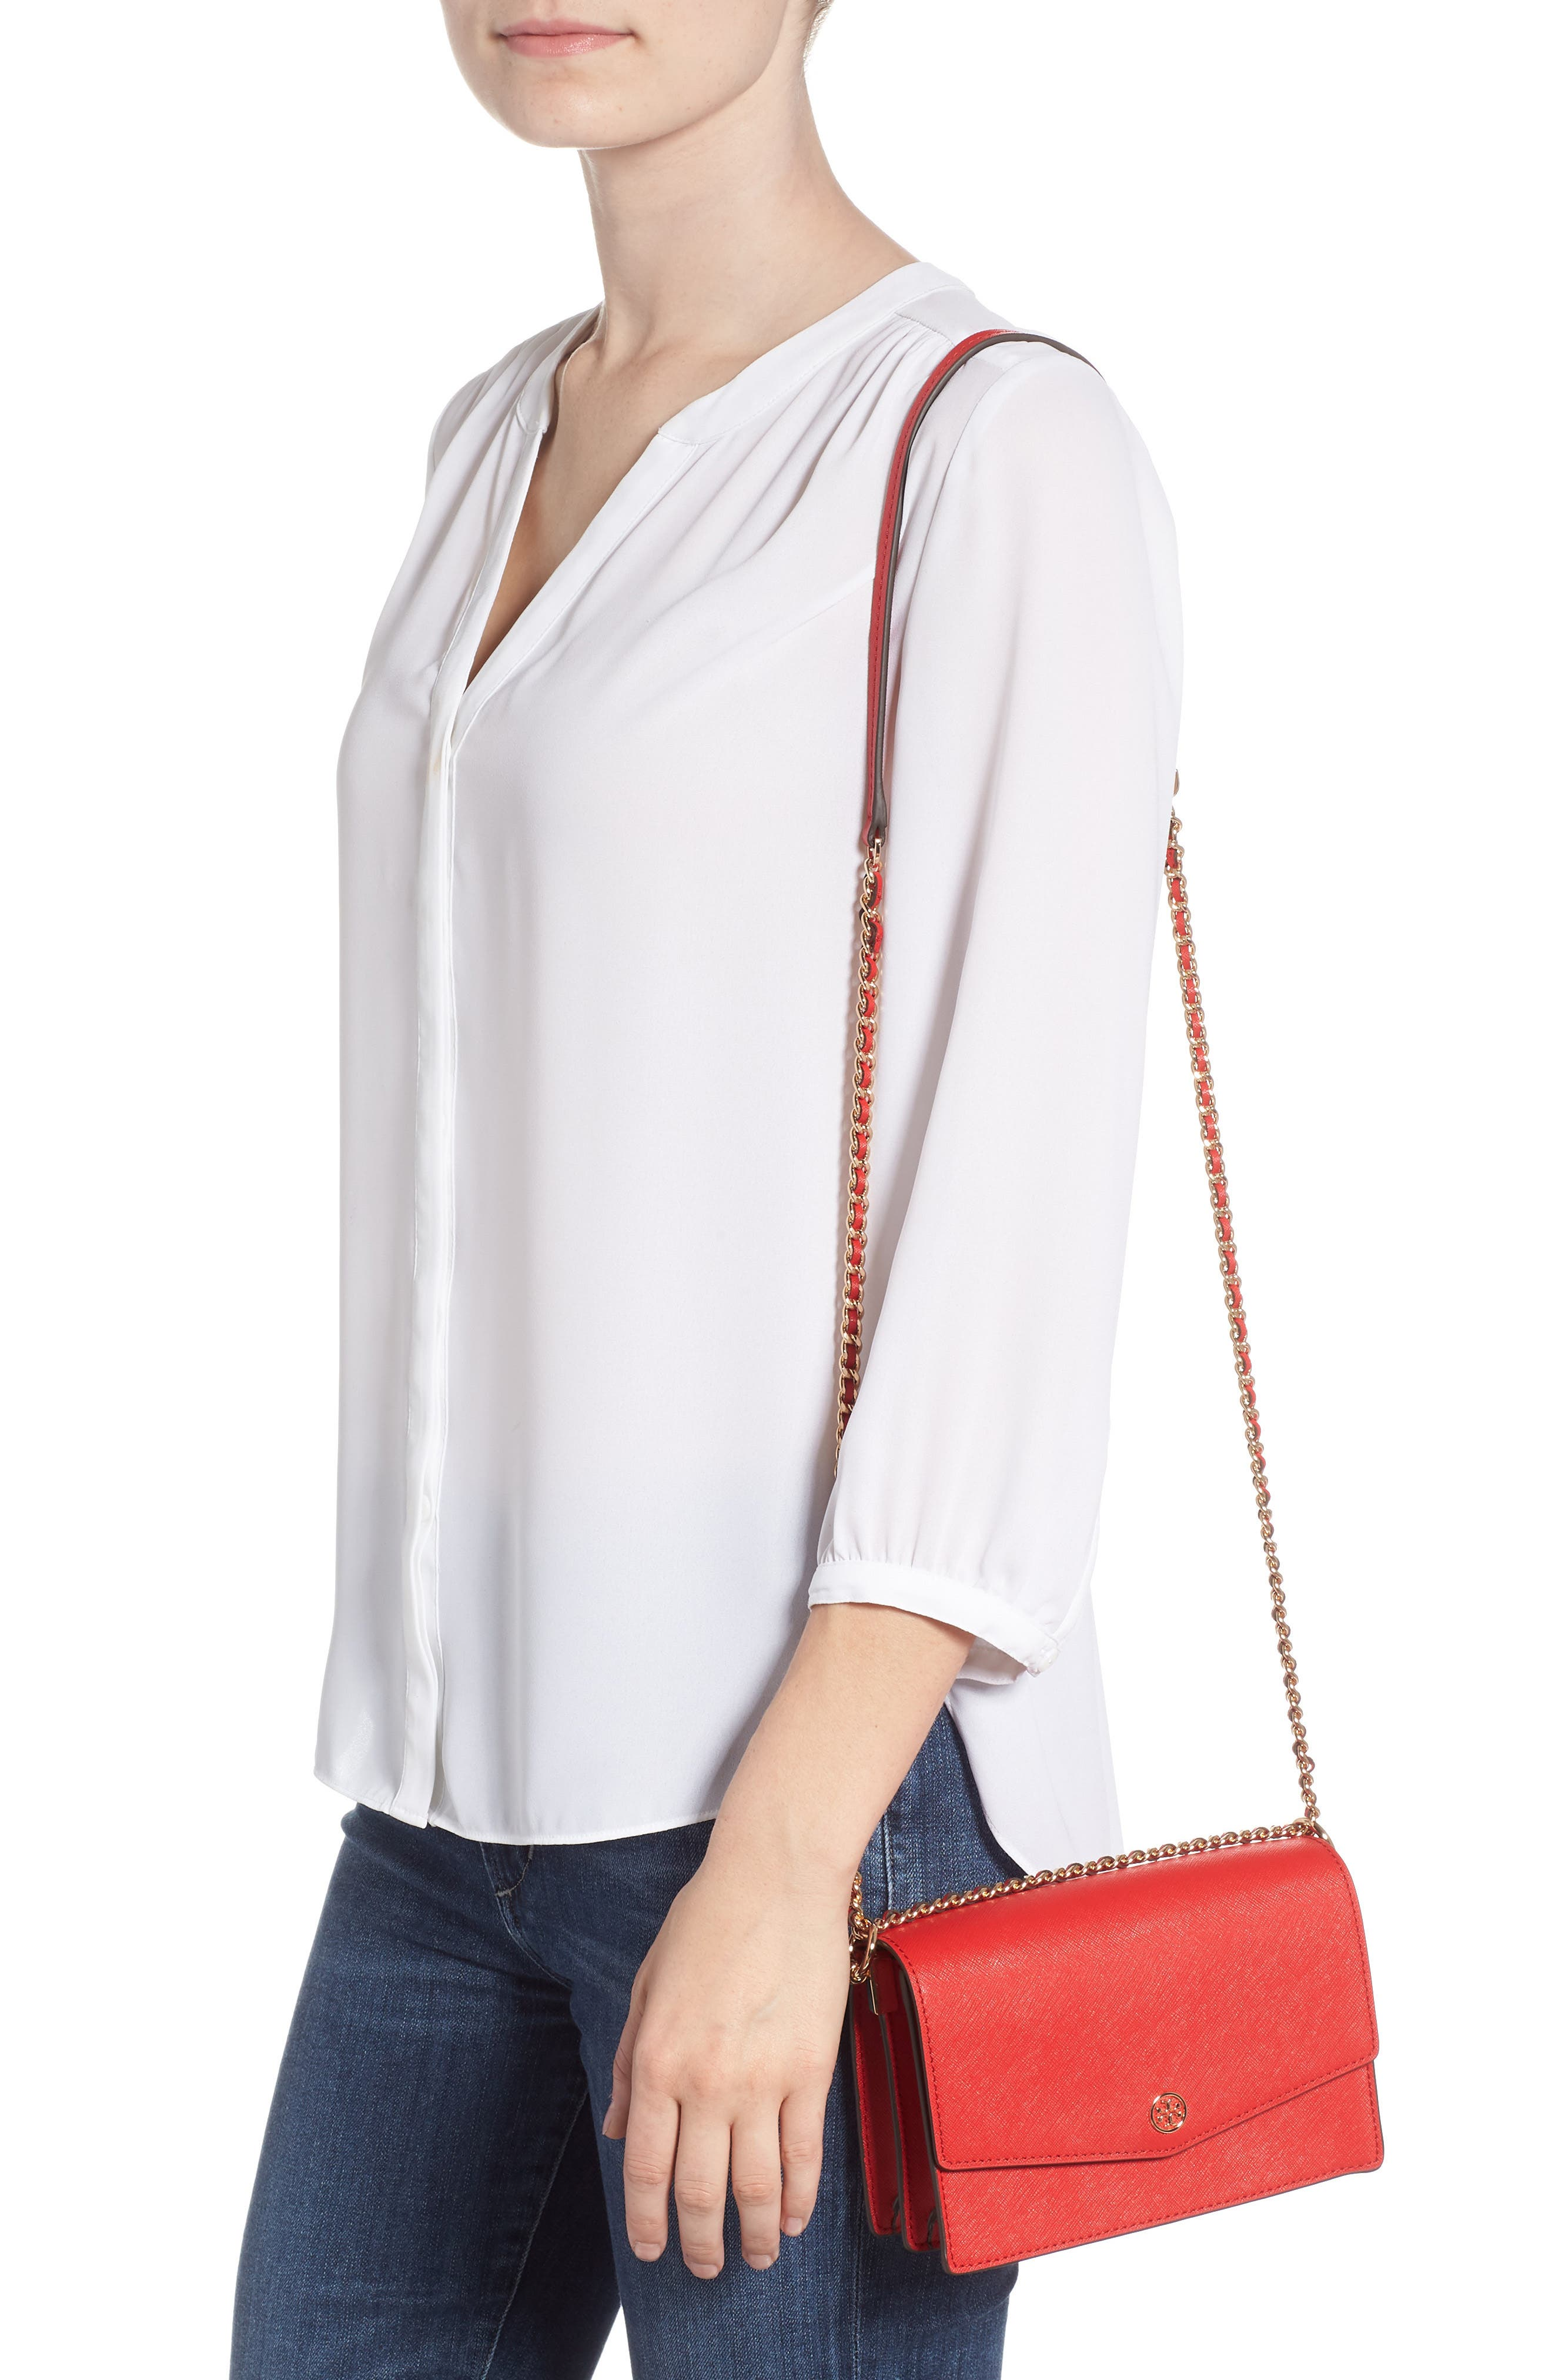 Mini Robinson Convertible Leather Shoulder Bag,                             Alternate thumbnail 2, color,                             BRILLIANT RED